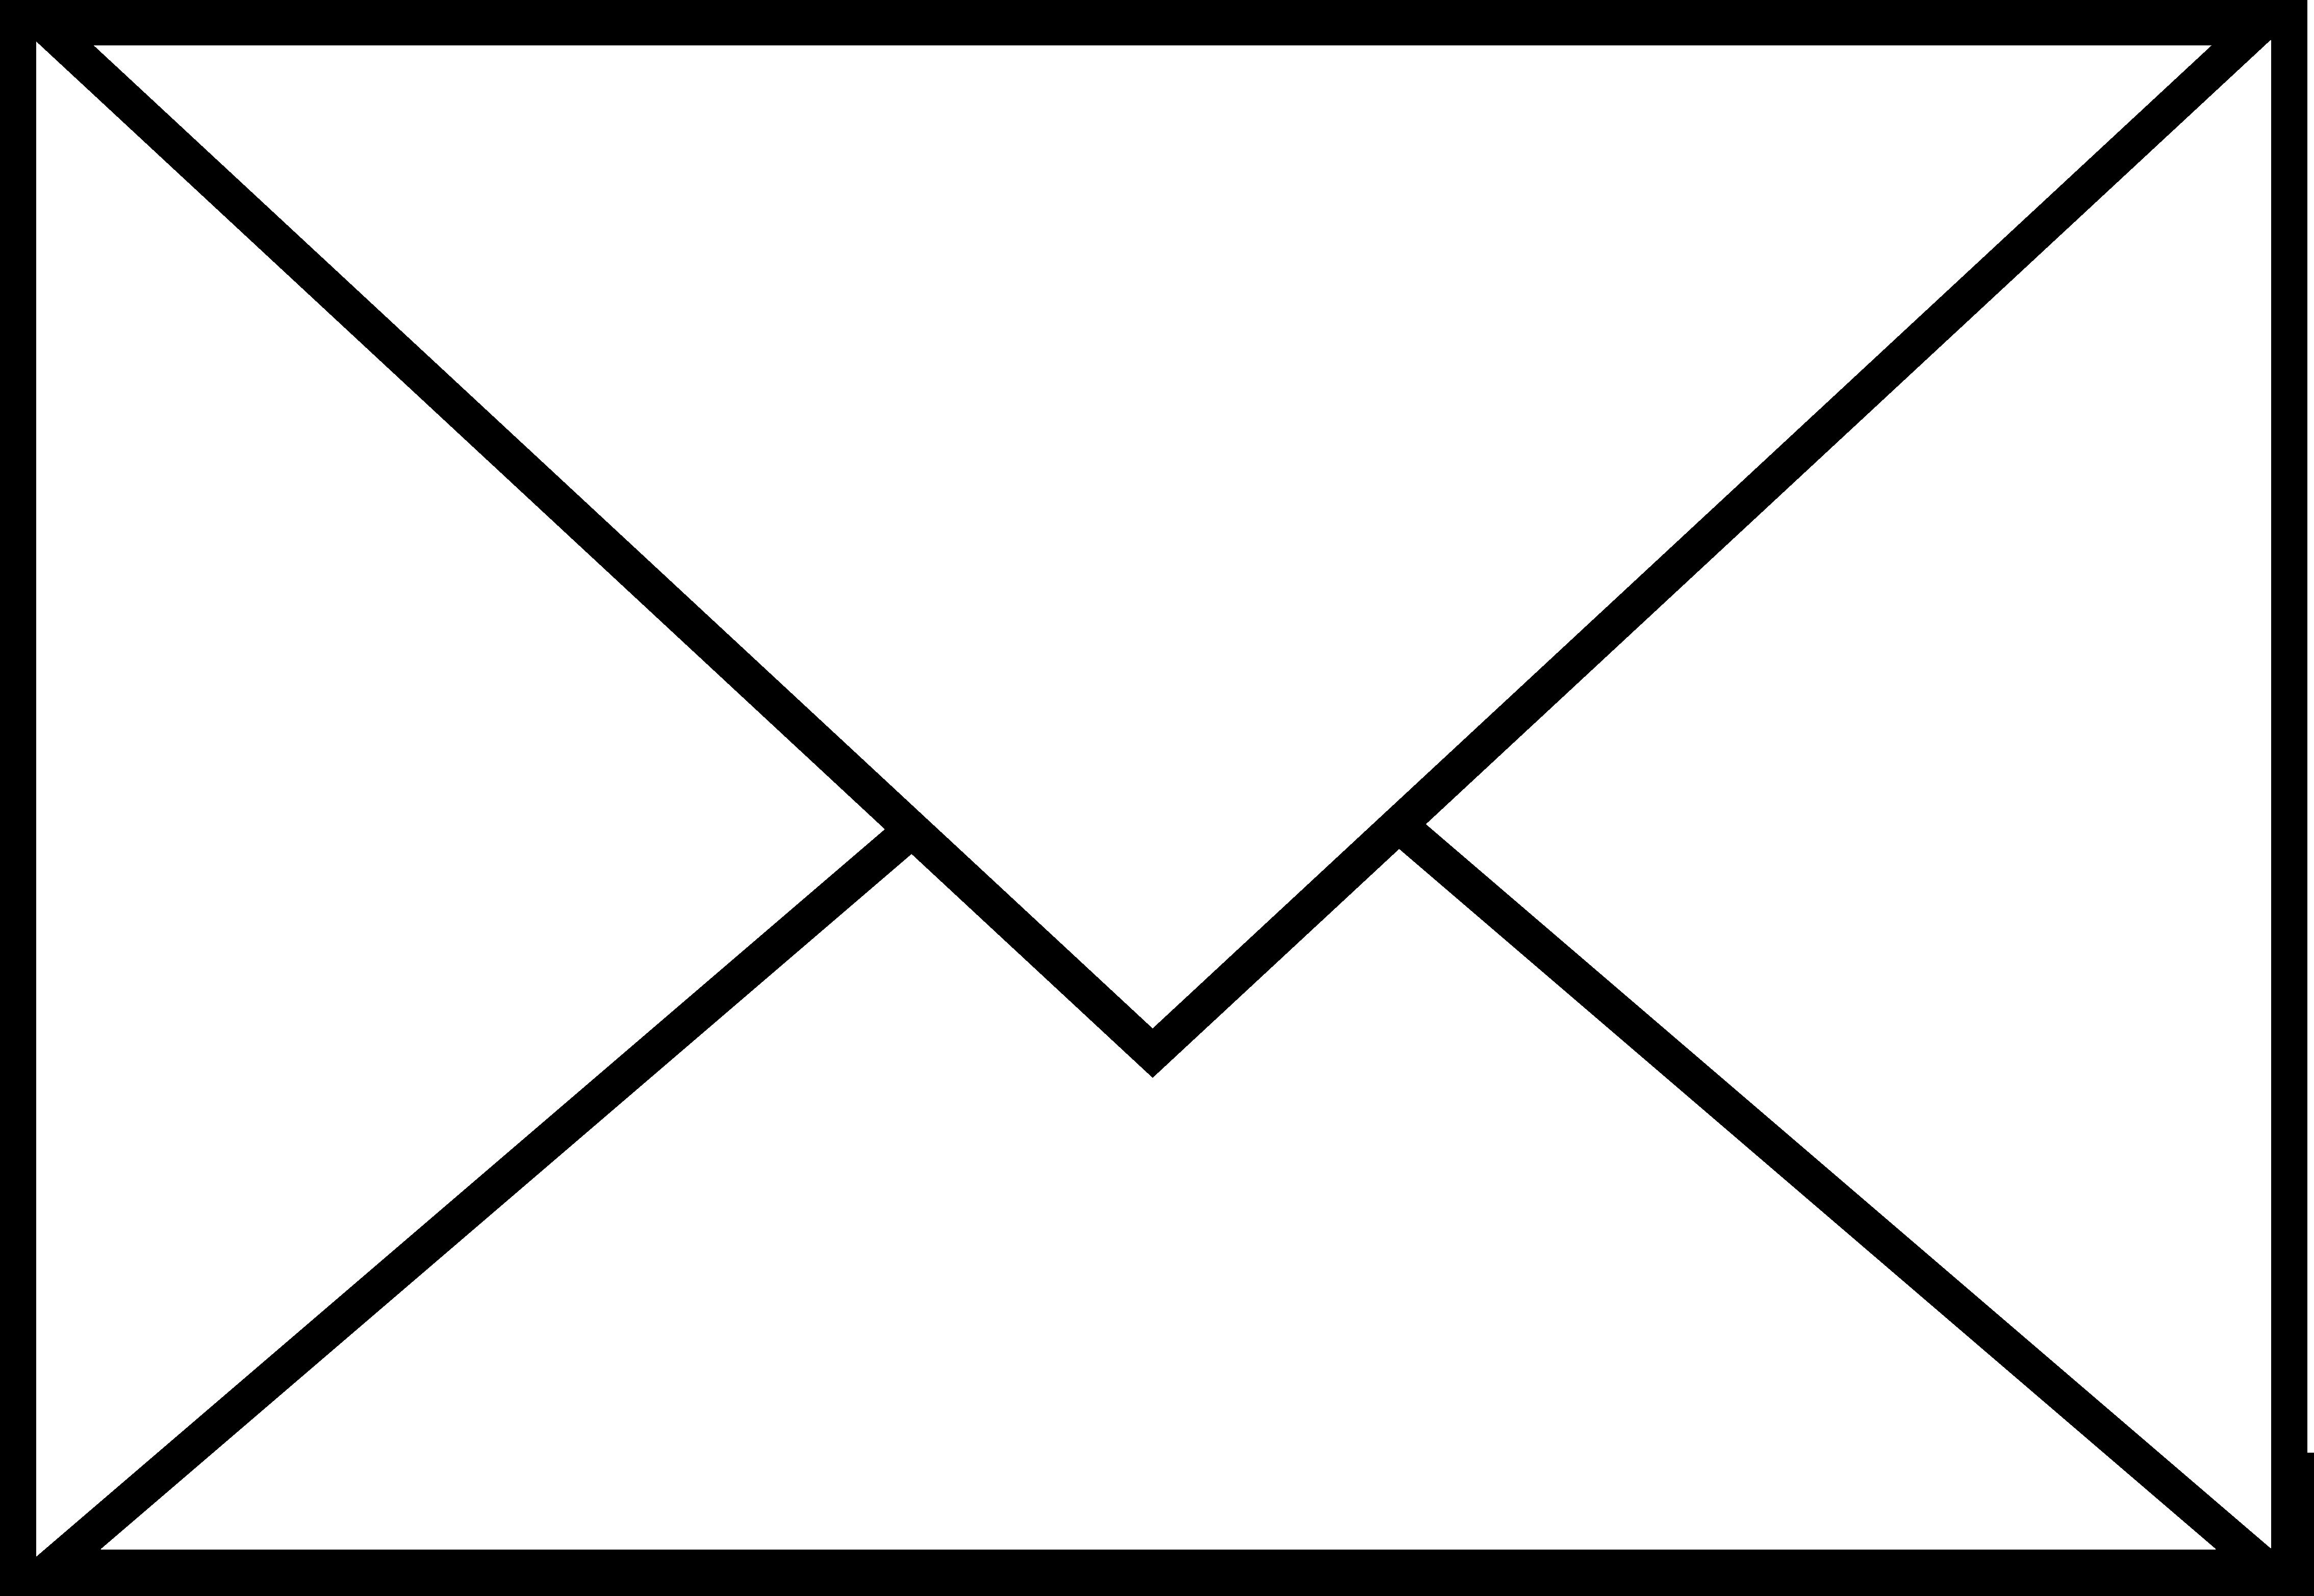 Letter Clipart Black And White - 101 Clip Art